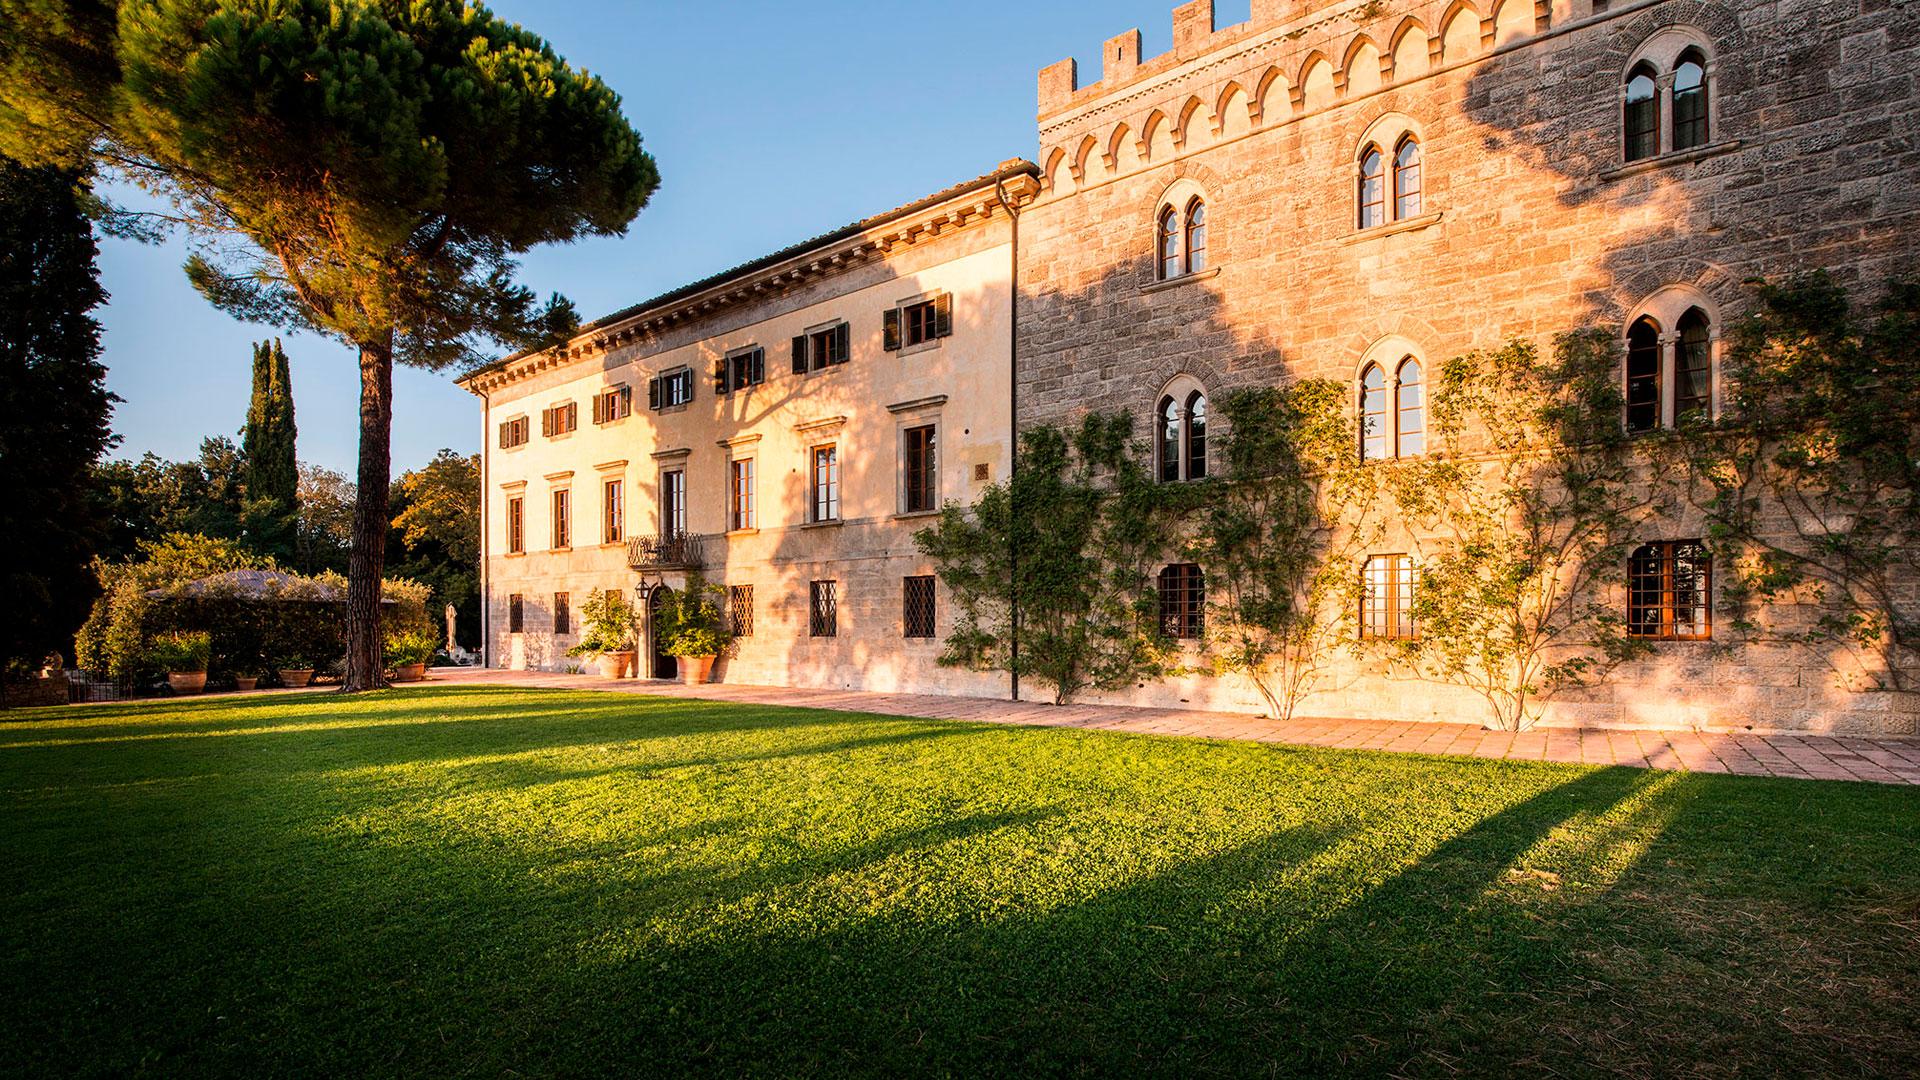 Cita en la Toscana hero asset